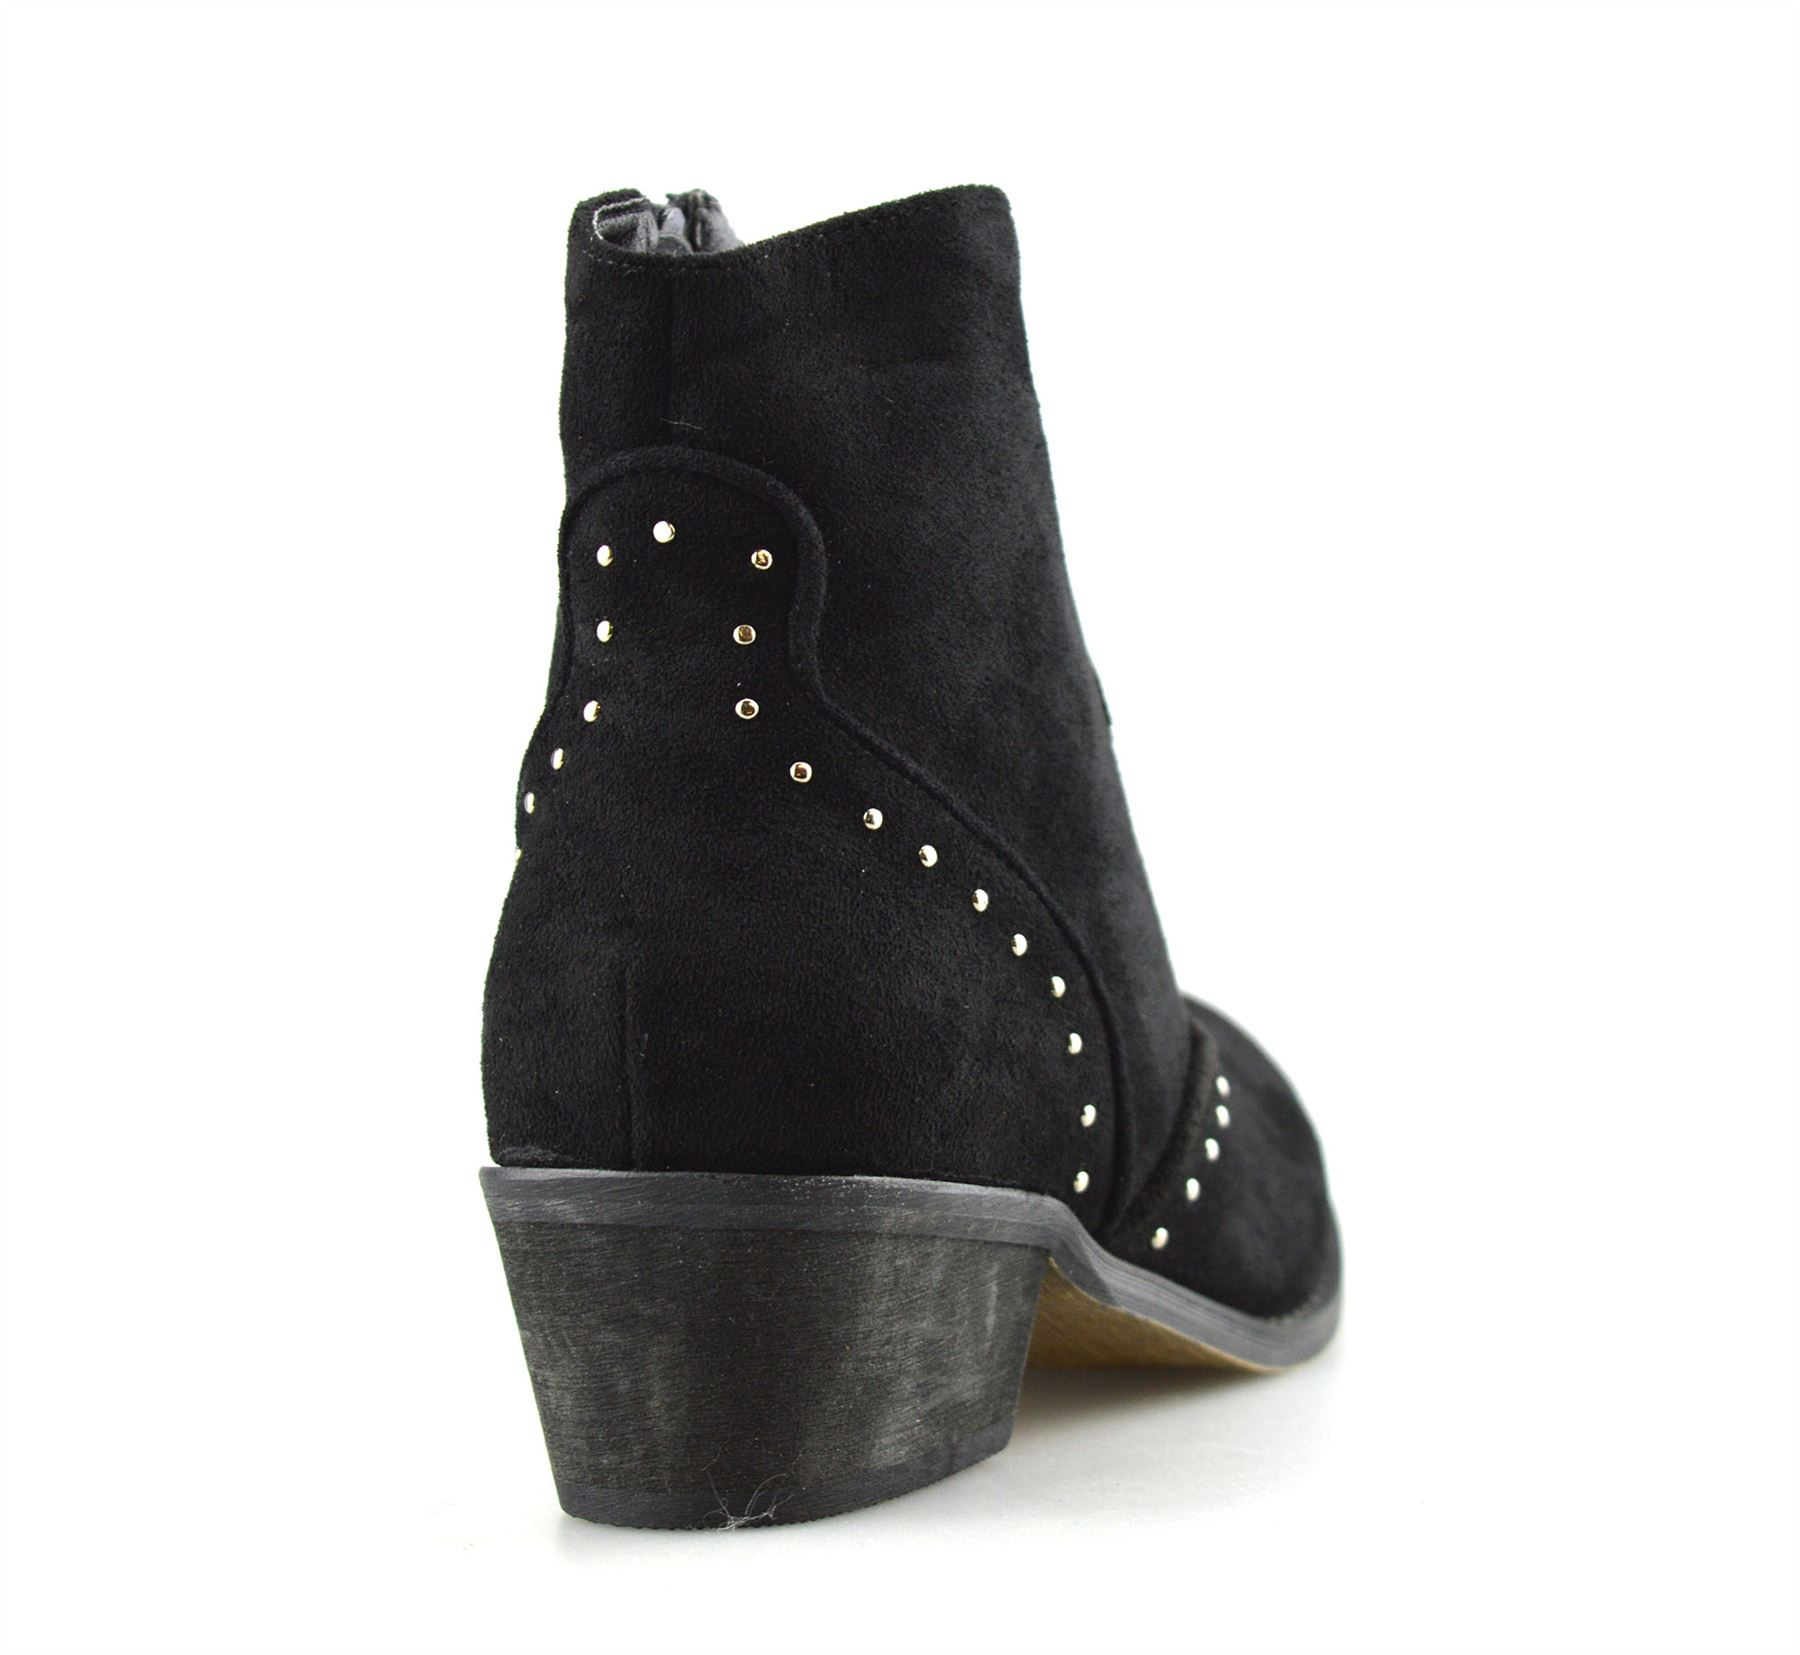 Ladies-Womens-Suede-Mid-Block-Heel-Zip-Up-Ankle-Cowboy-Biker-Boots-Shoes-Size thumbnail 15